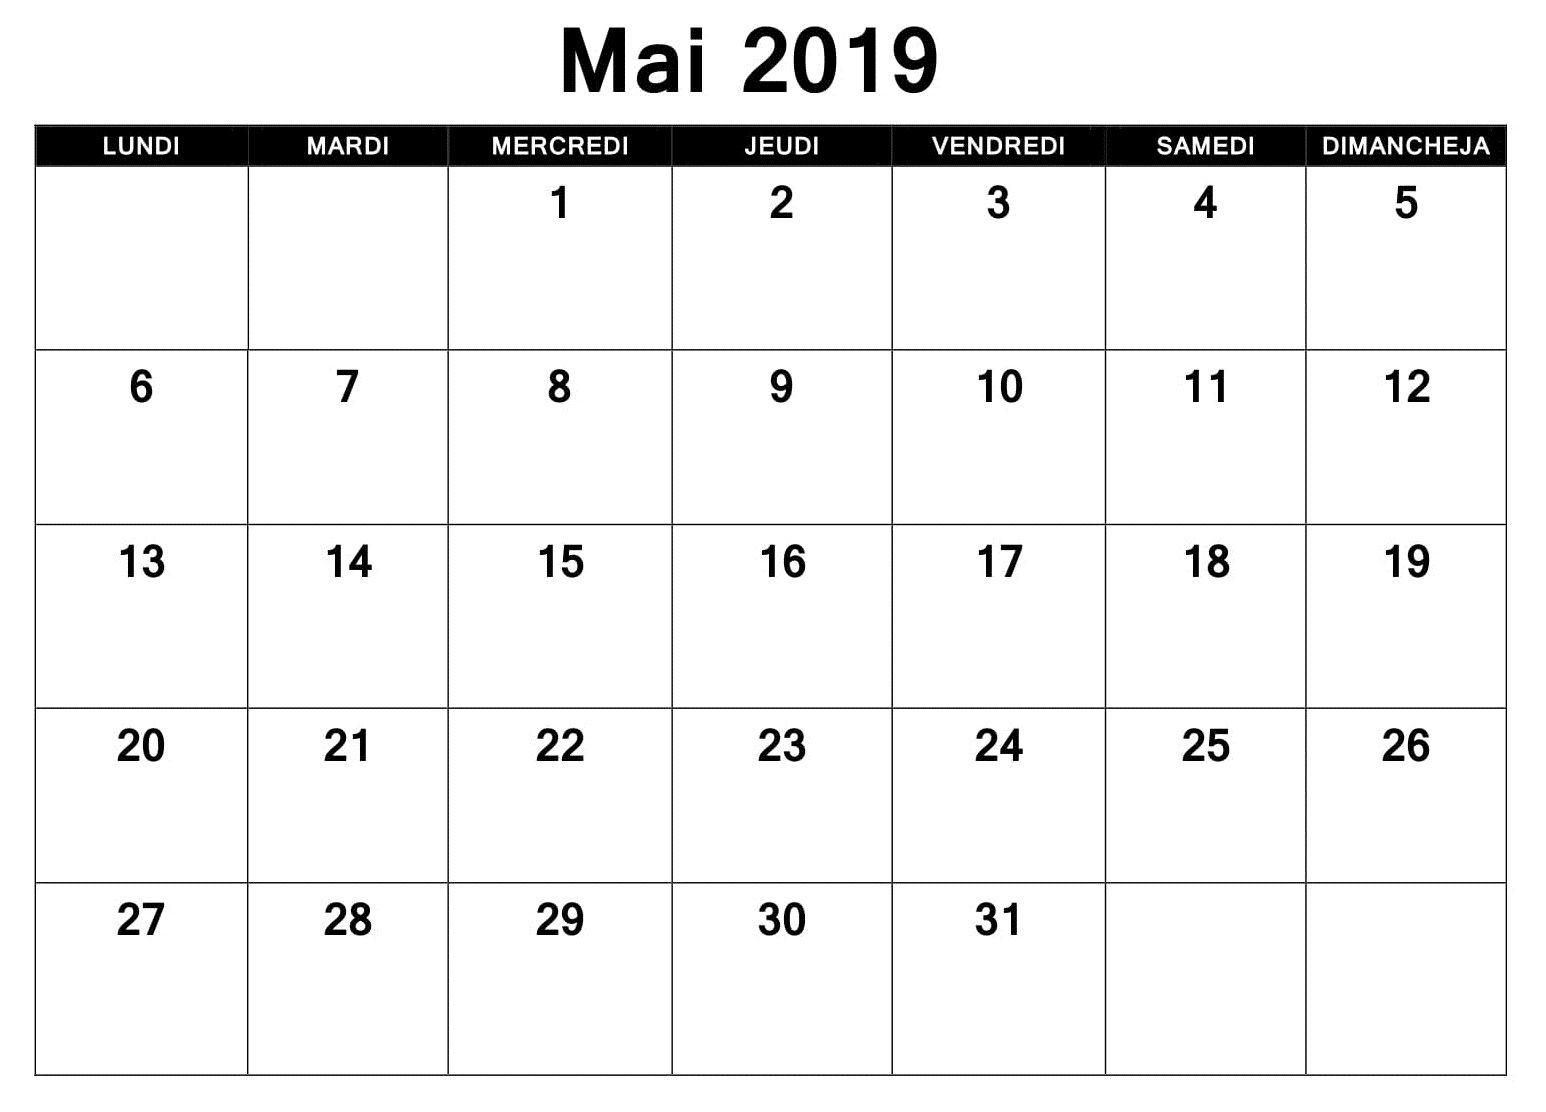 Template Calendrier 2019.Mai Calendrier 2019 Excel Excel Calendar Template